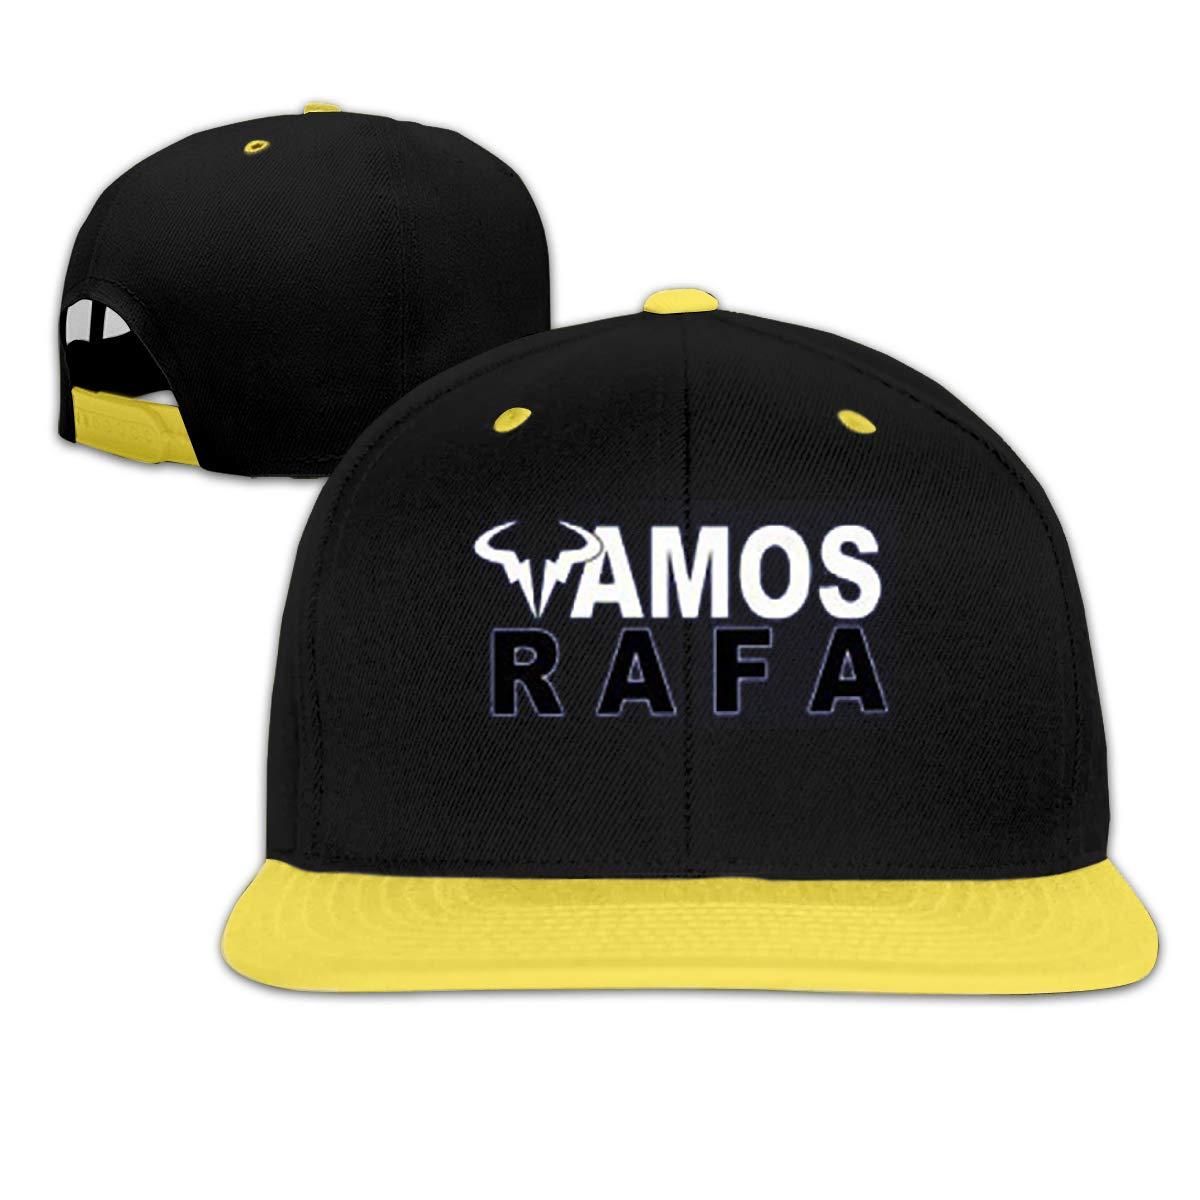 JJHH SHOP Rafael Nadal Vamos Childrens Boy Girls Contrast Hip Hop Baseball Caps Denim Hats